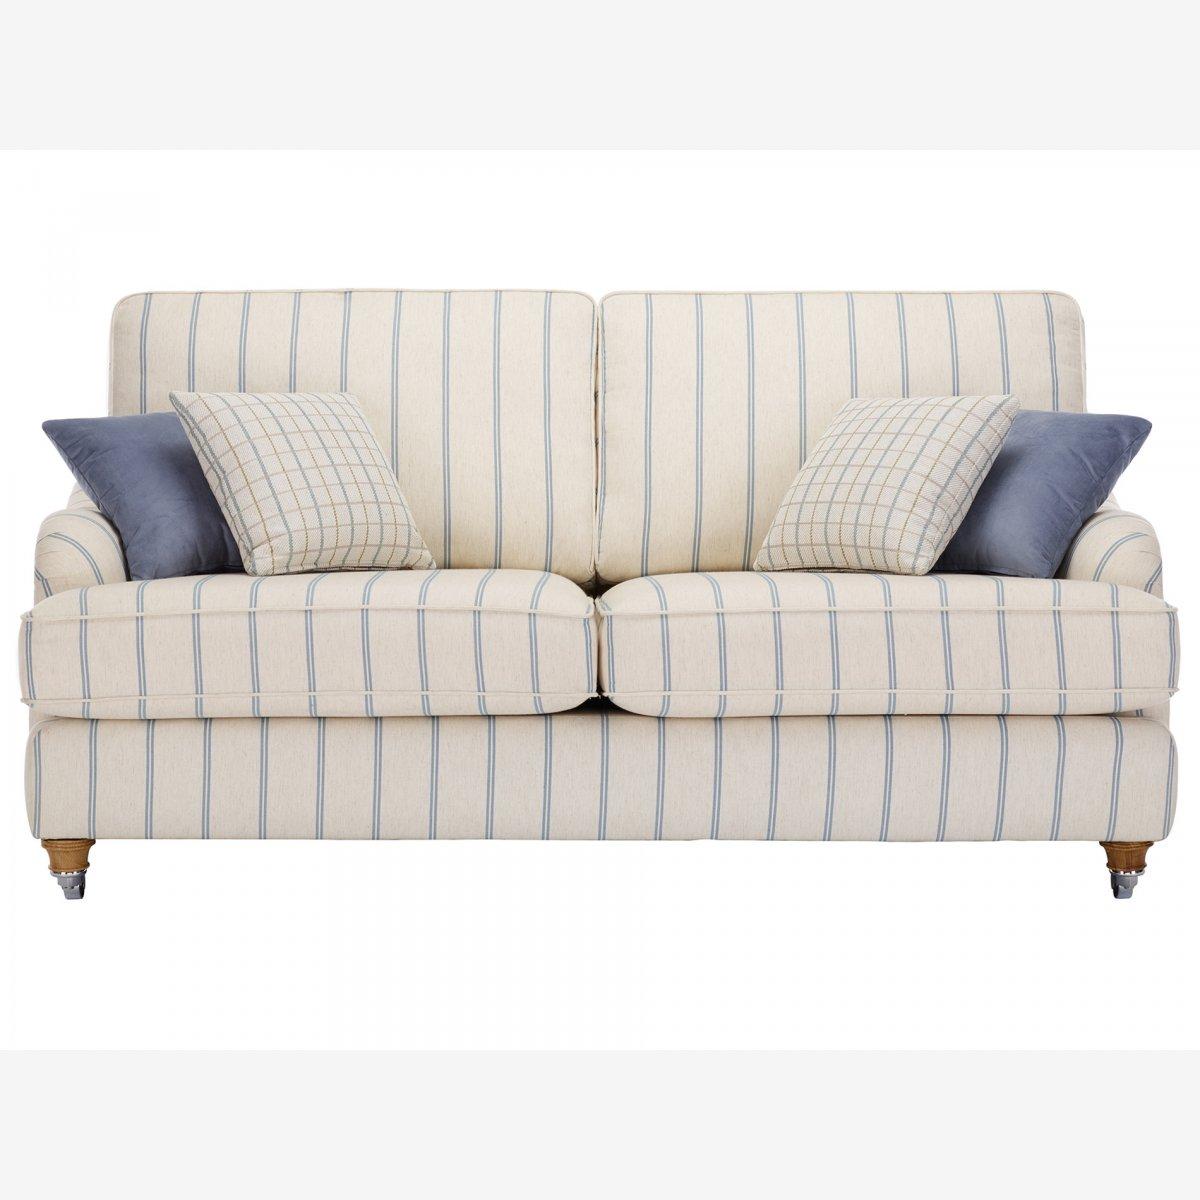 striped fabric sofas uk natuzzi sectional leather sofa westbury 3 seater in kendrick stripe